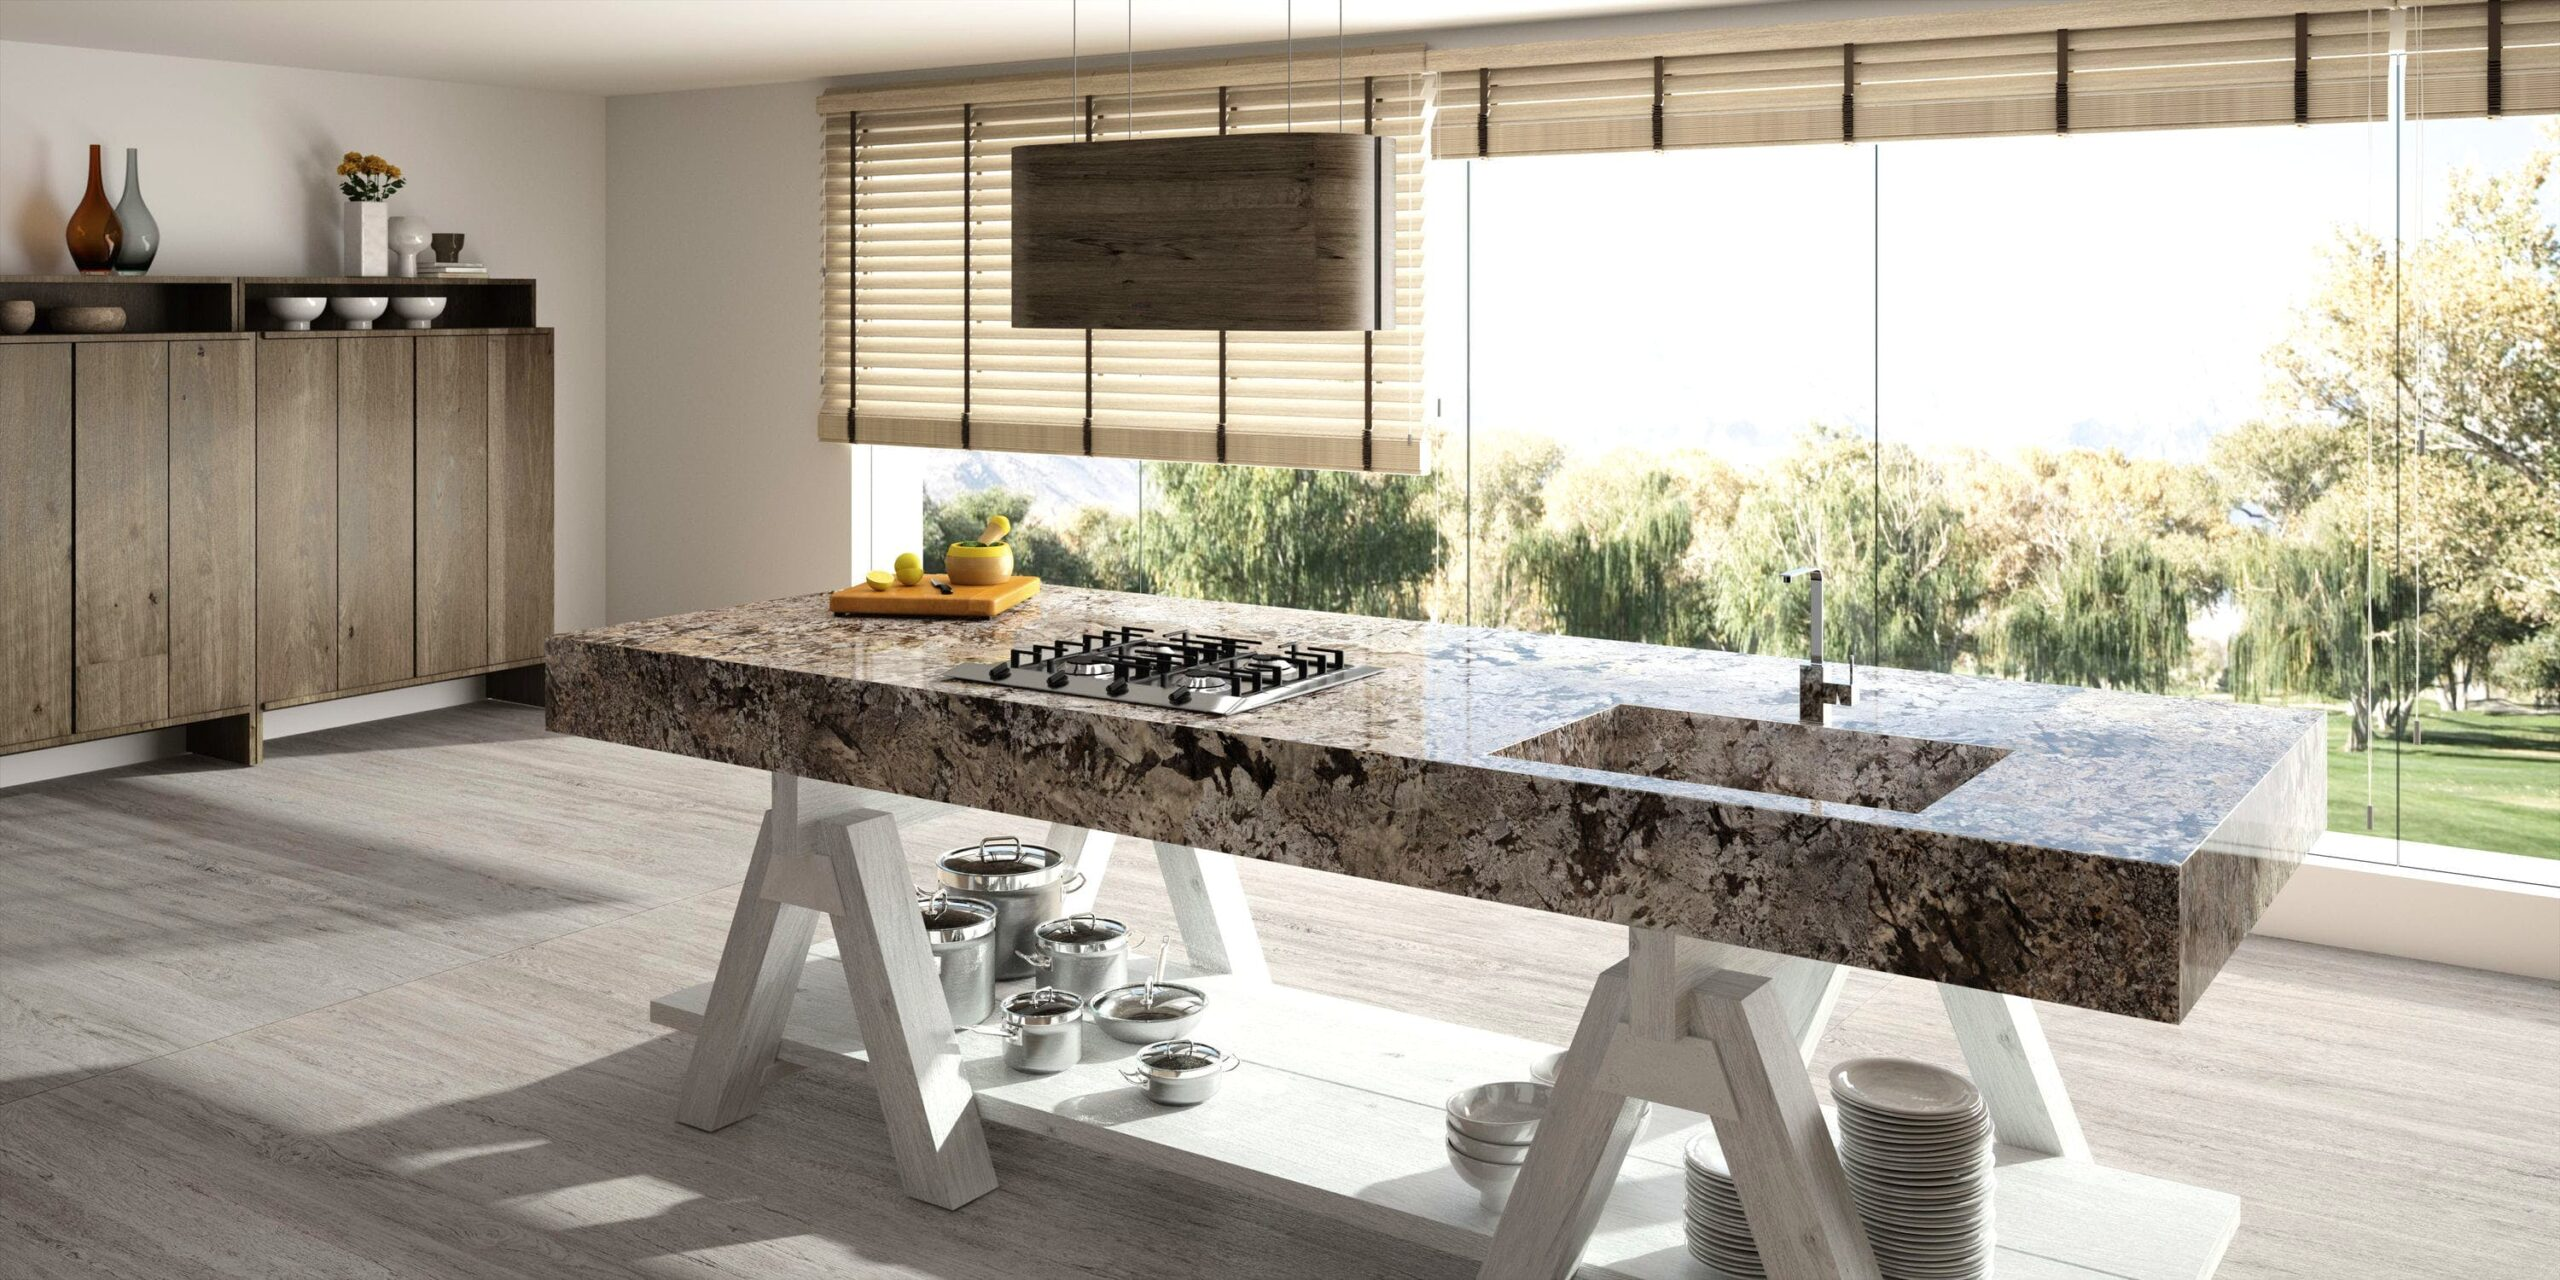 Image of 50842 12053709 6 scaled in Kitchen Decor Trends -The Uncommon Elegance of Bianco Antico Granite - Cosentino